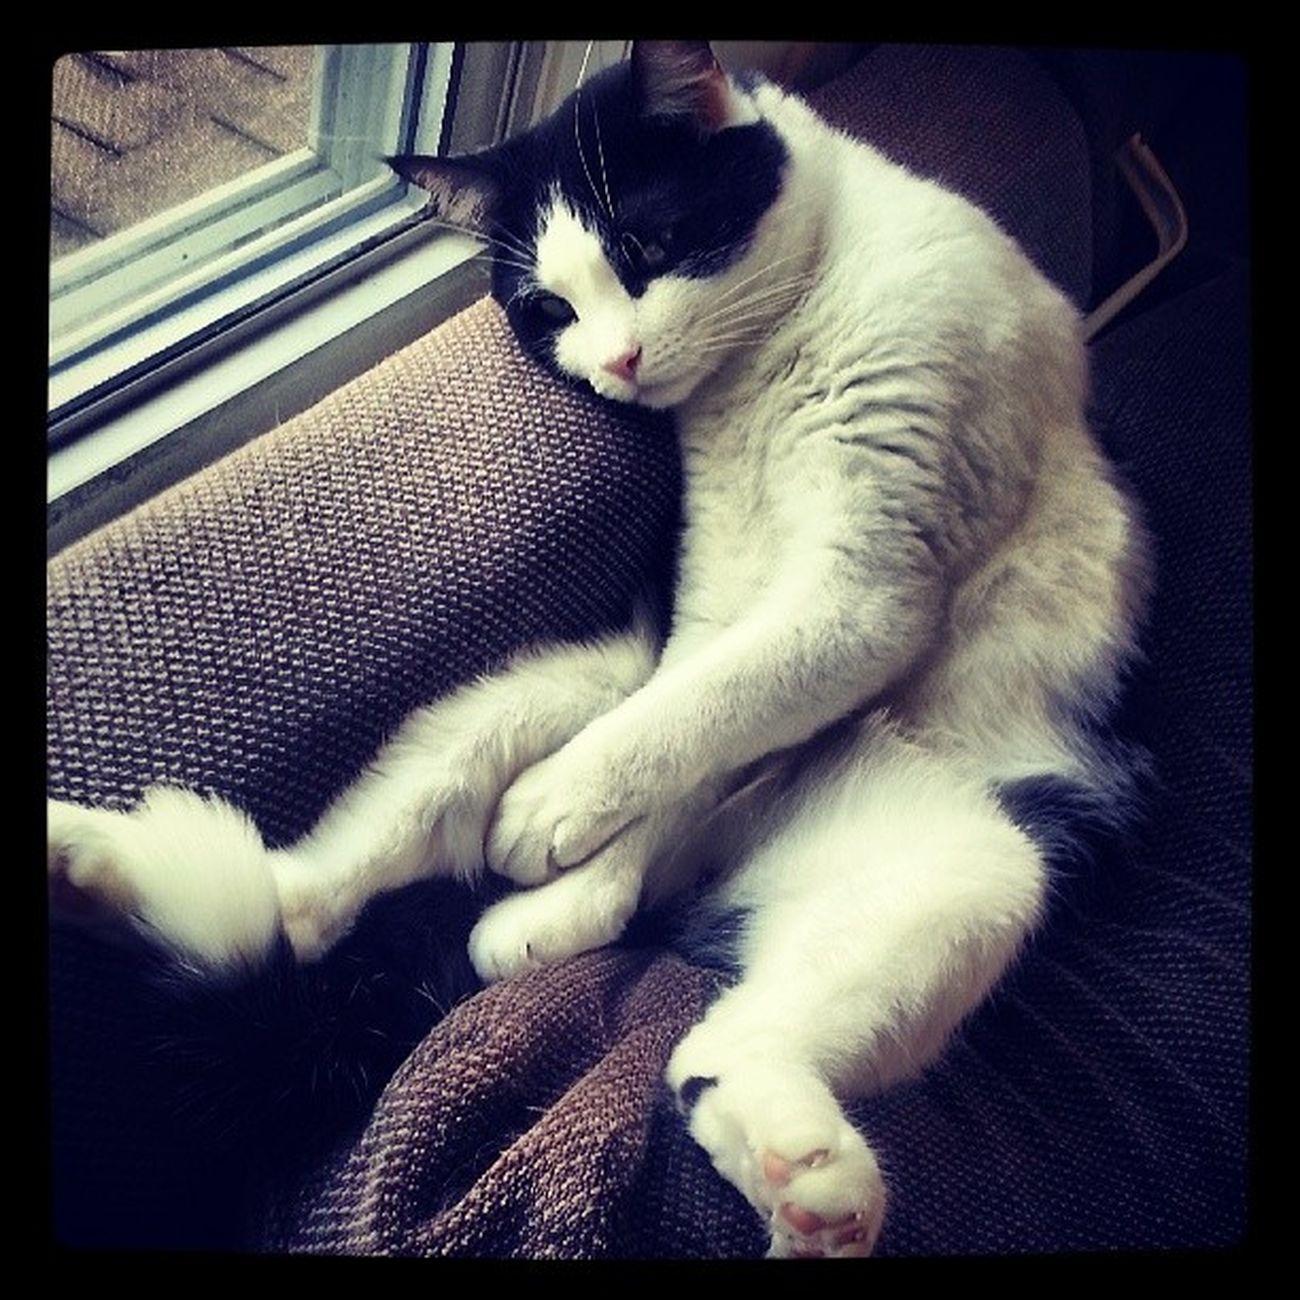 Richardthecat Catsofinstagram Tuckeredout Catssleepfunny picoftheday